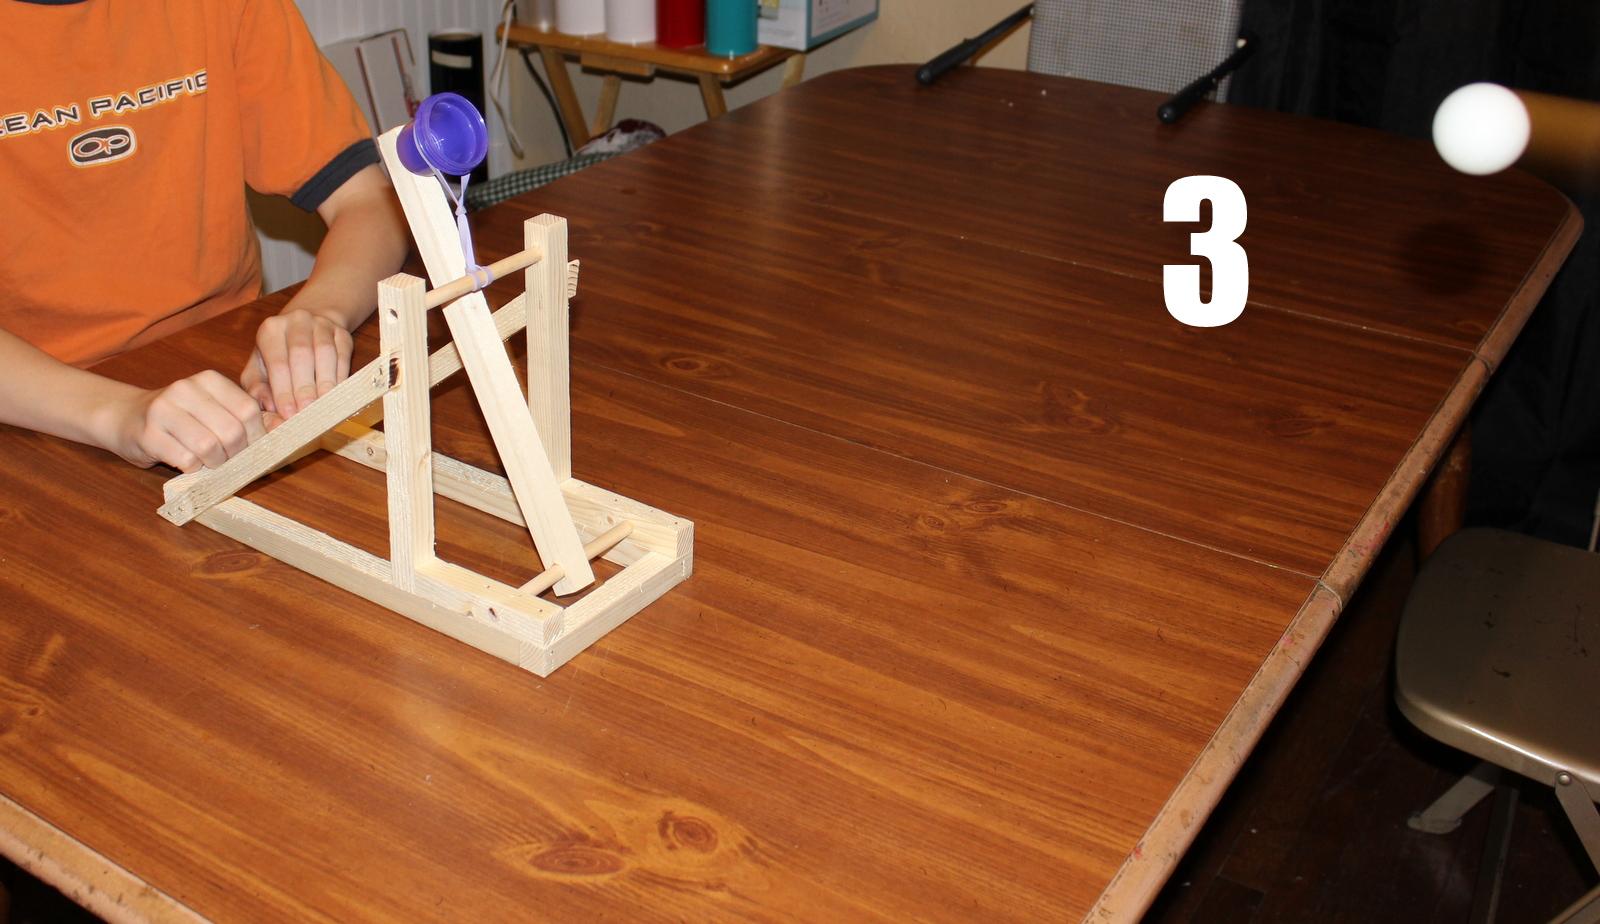 School Project Catapult Ideas